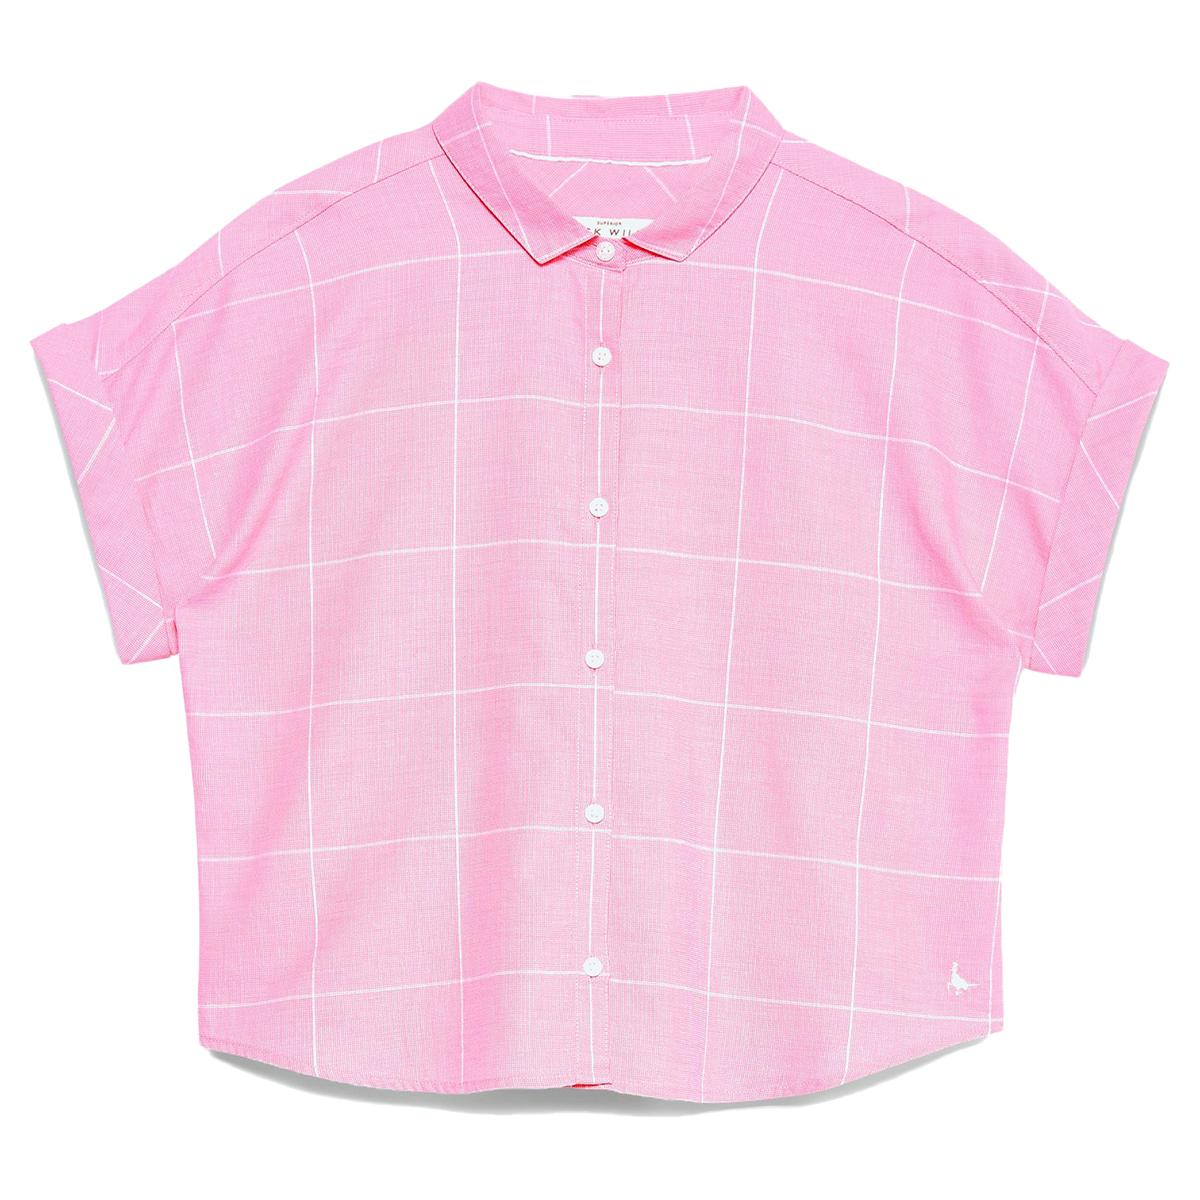 Jack Wills Women's Stowell Stripe Dolman Sleeve Shirt - Red, 10